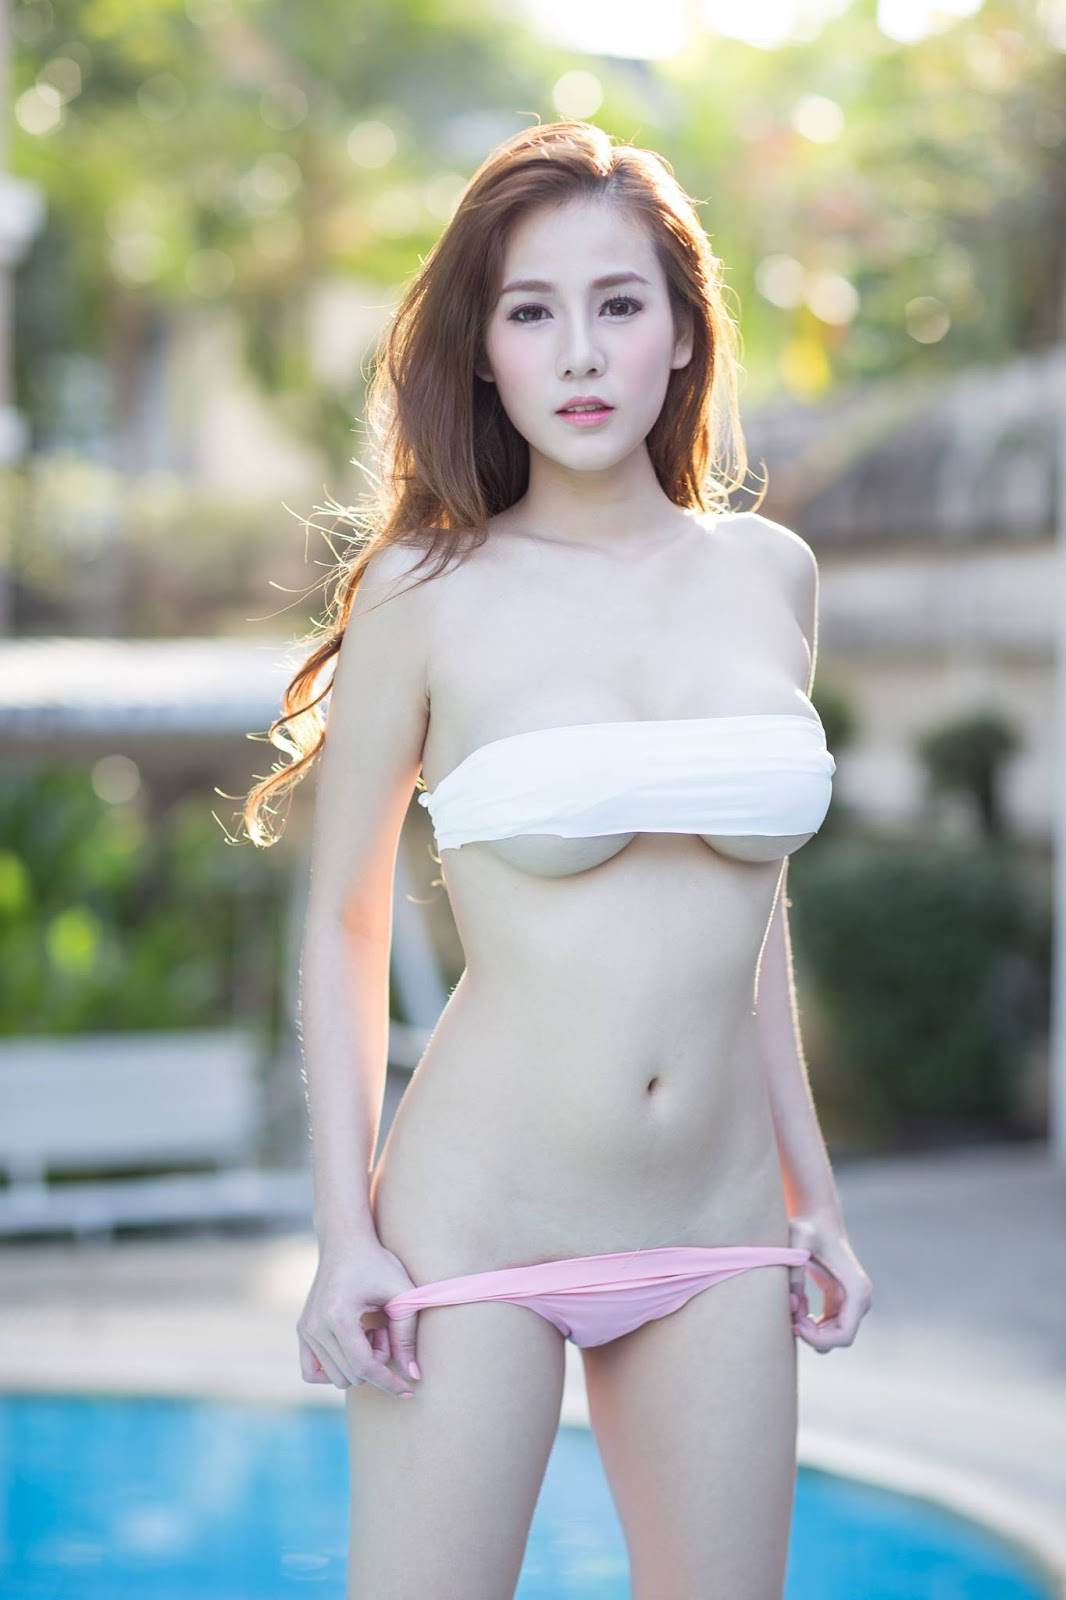 M Mn Palmiier Yangsuay Cc Nng Bng - Ngi Sao Sexy-9704